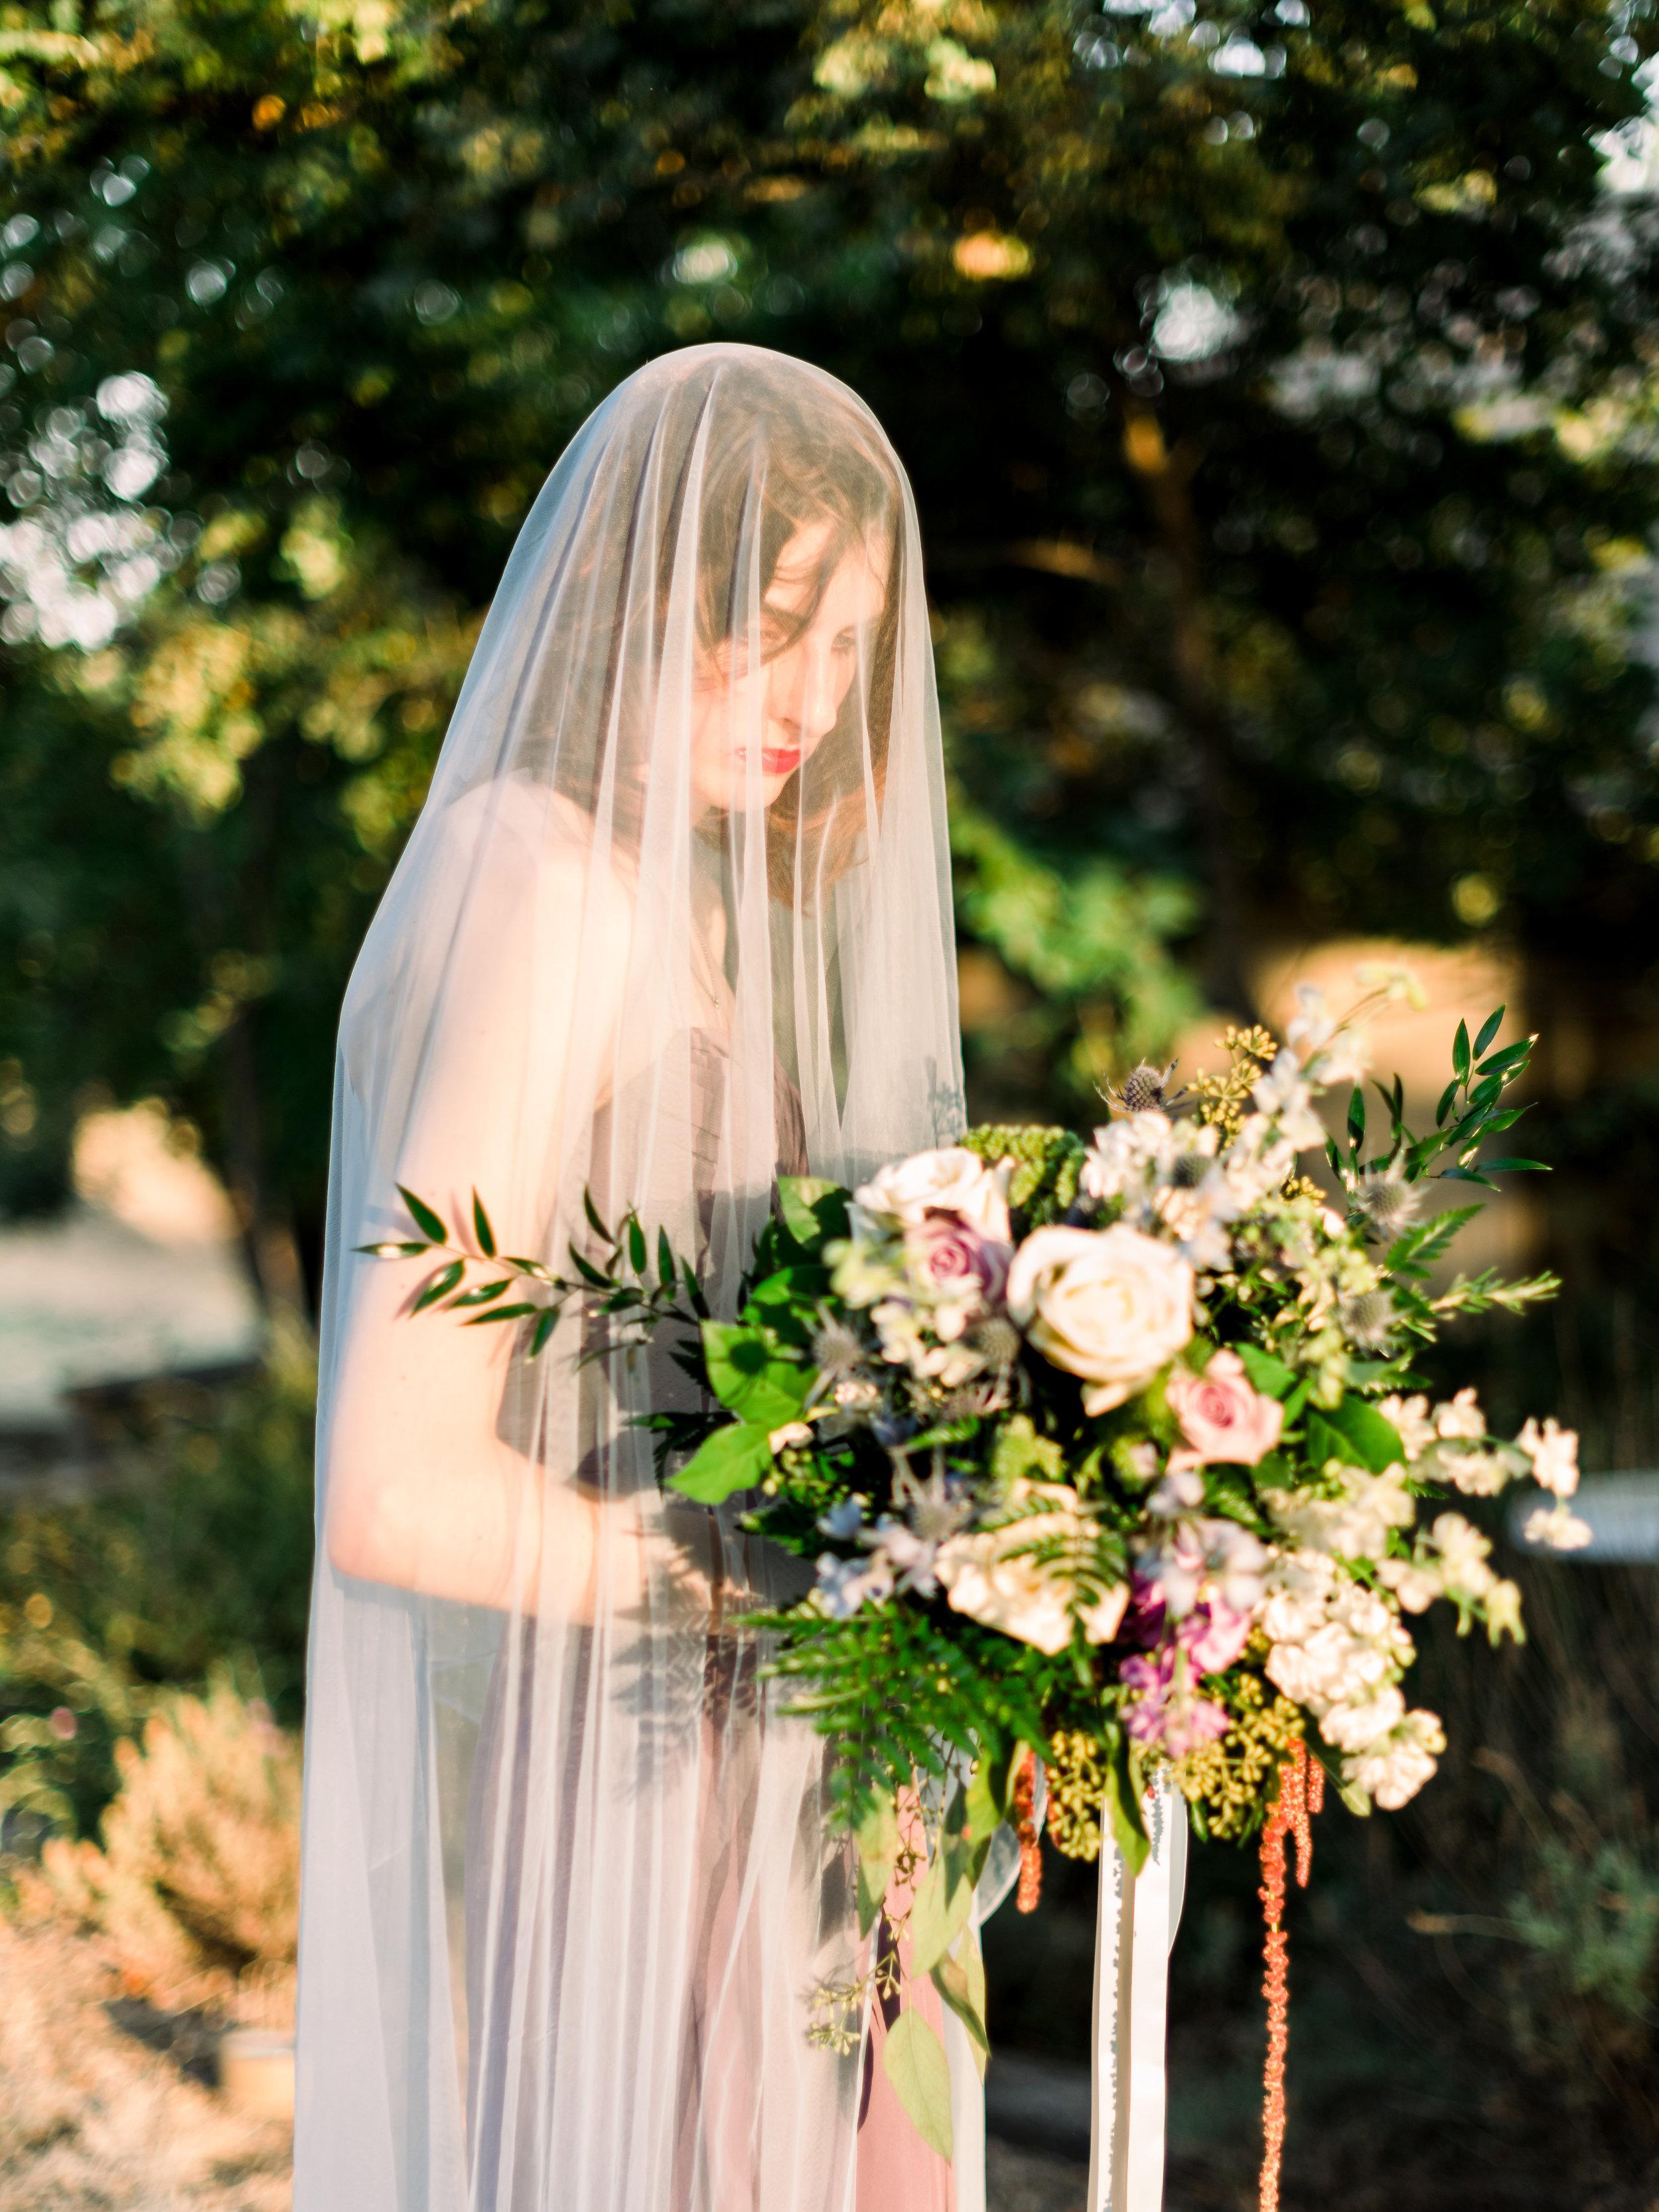 veiled-bride-holding-a-bouquet.jpg